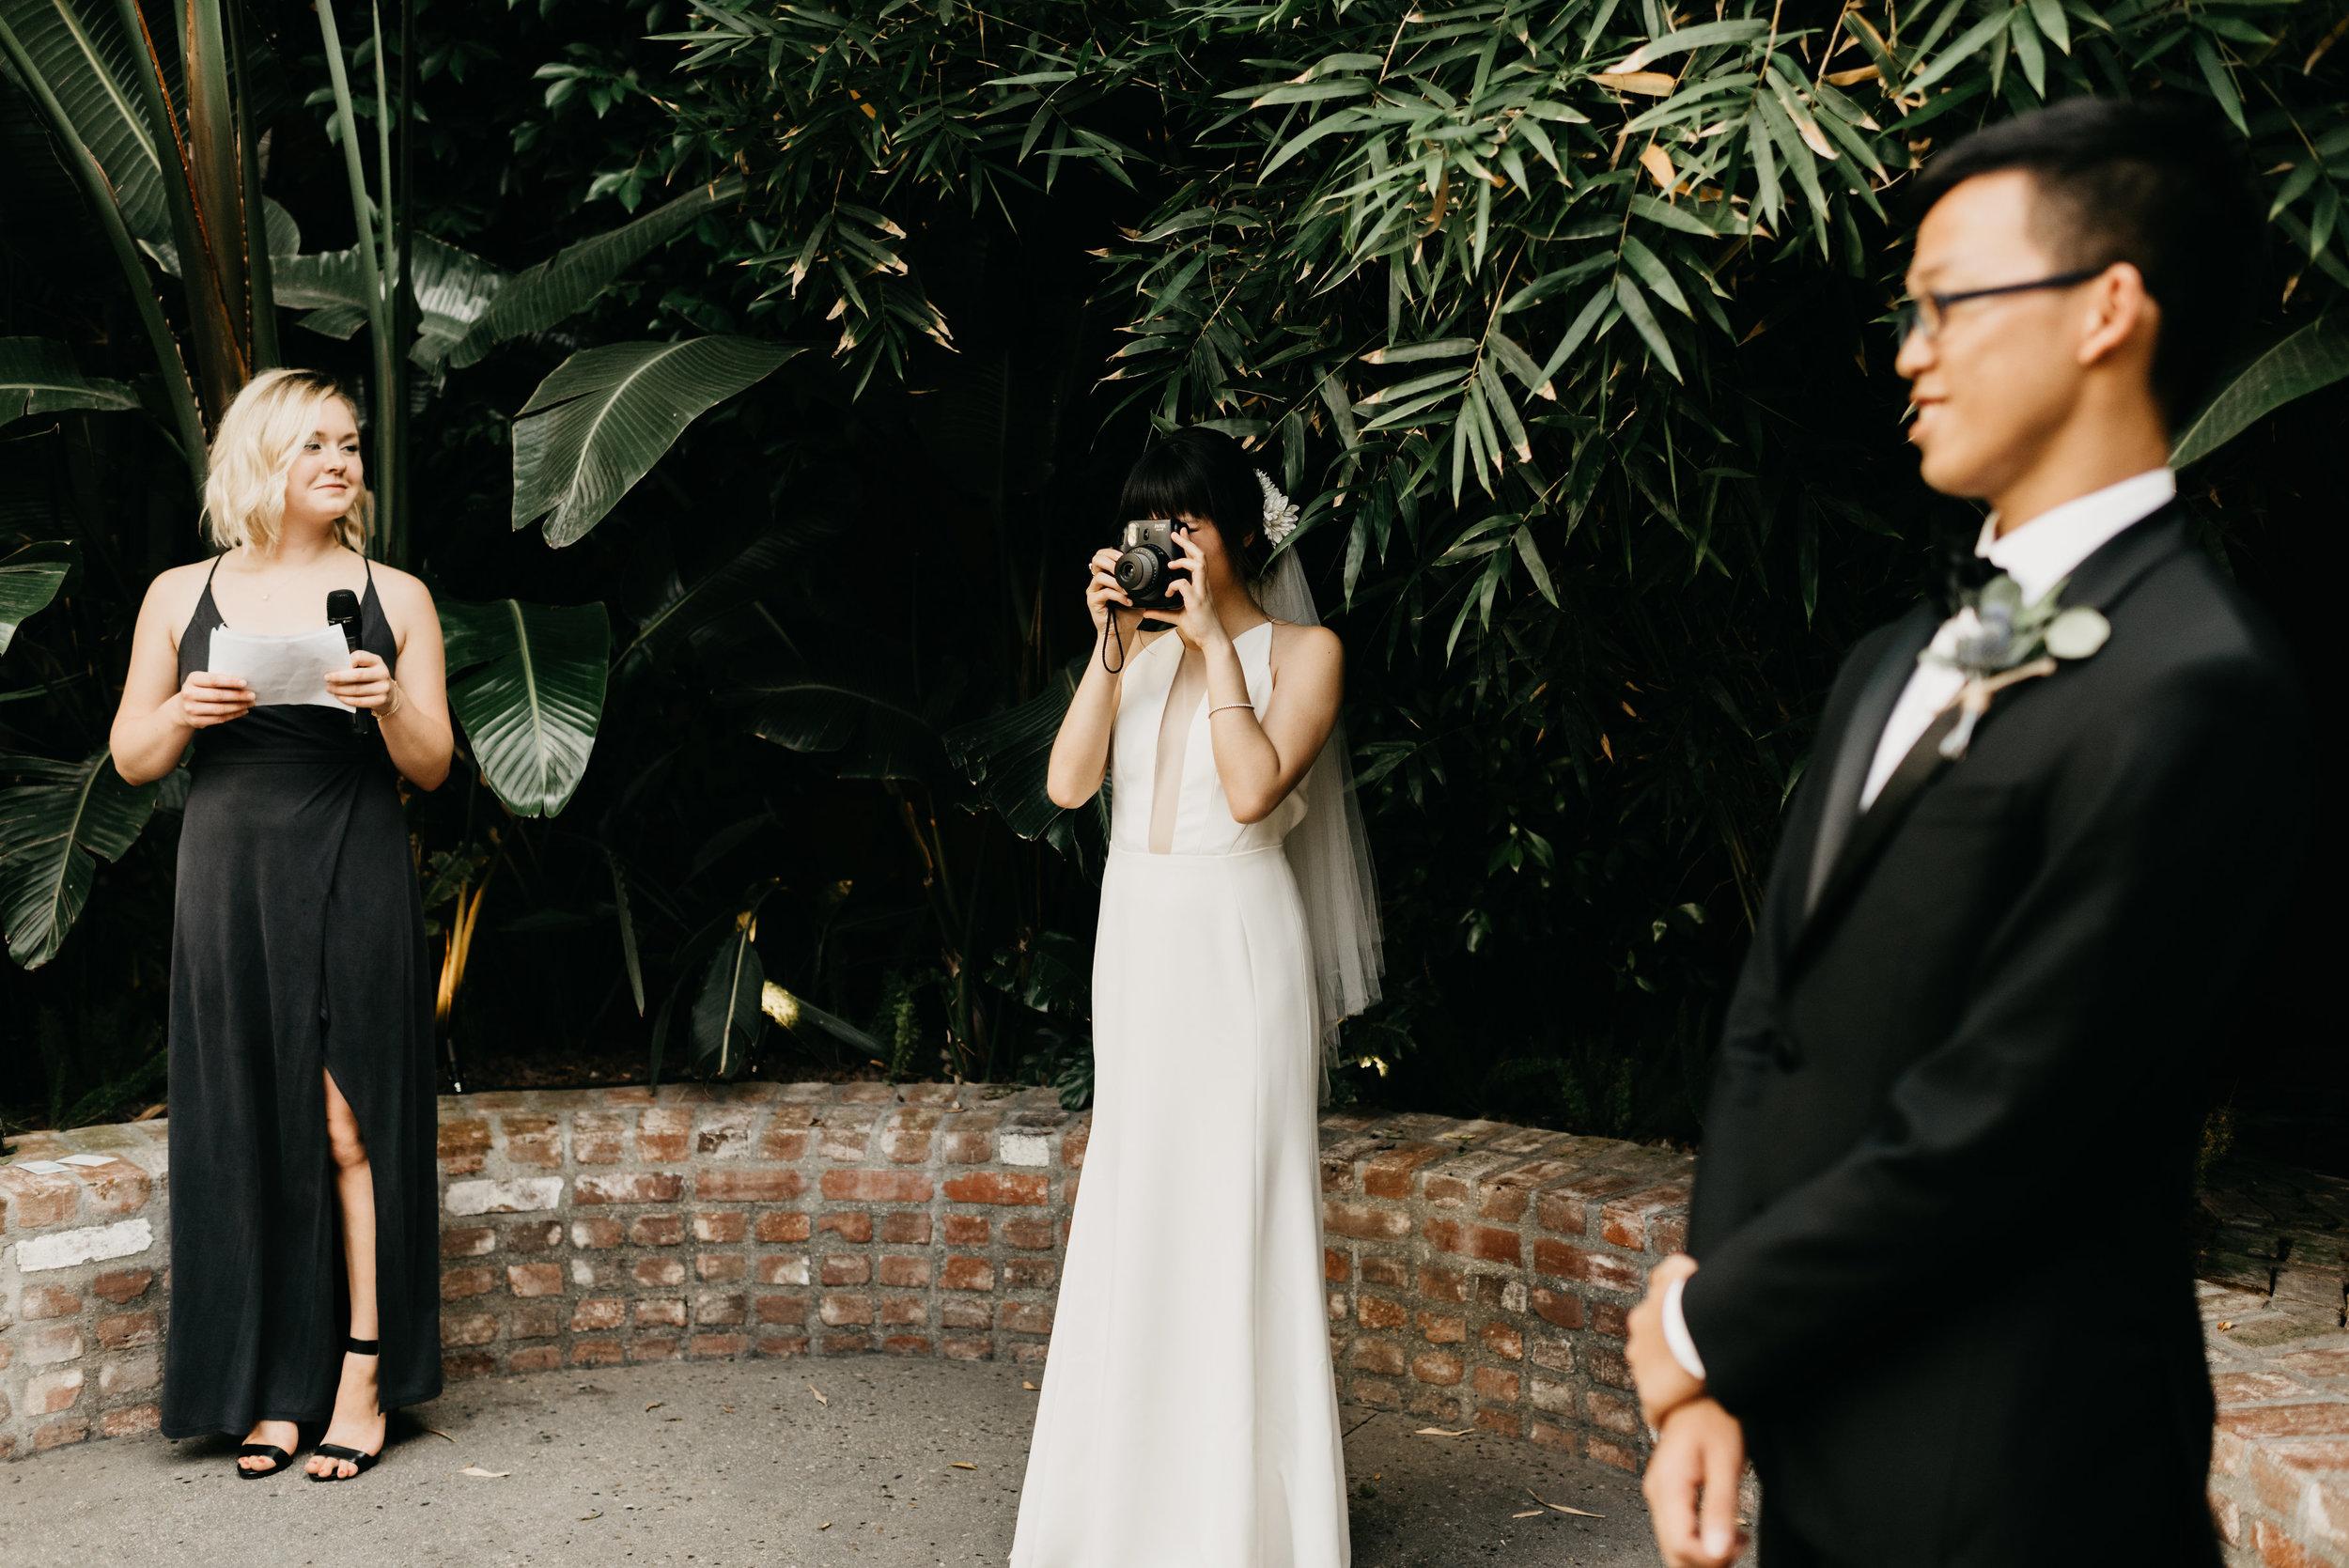 Millwick-wedding-planner67.jpg